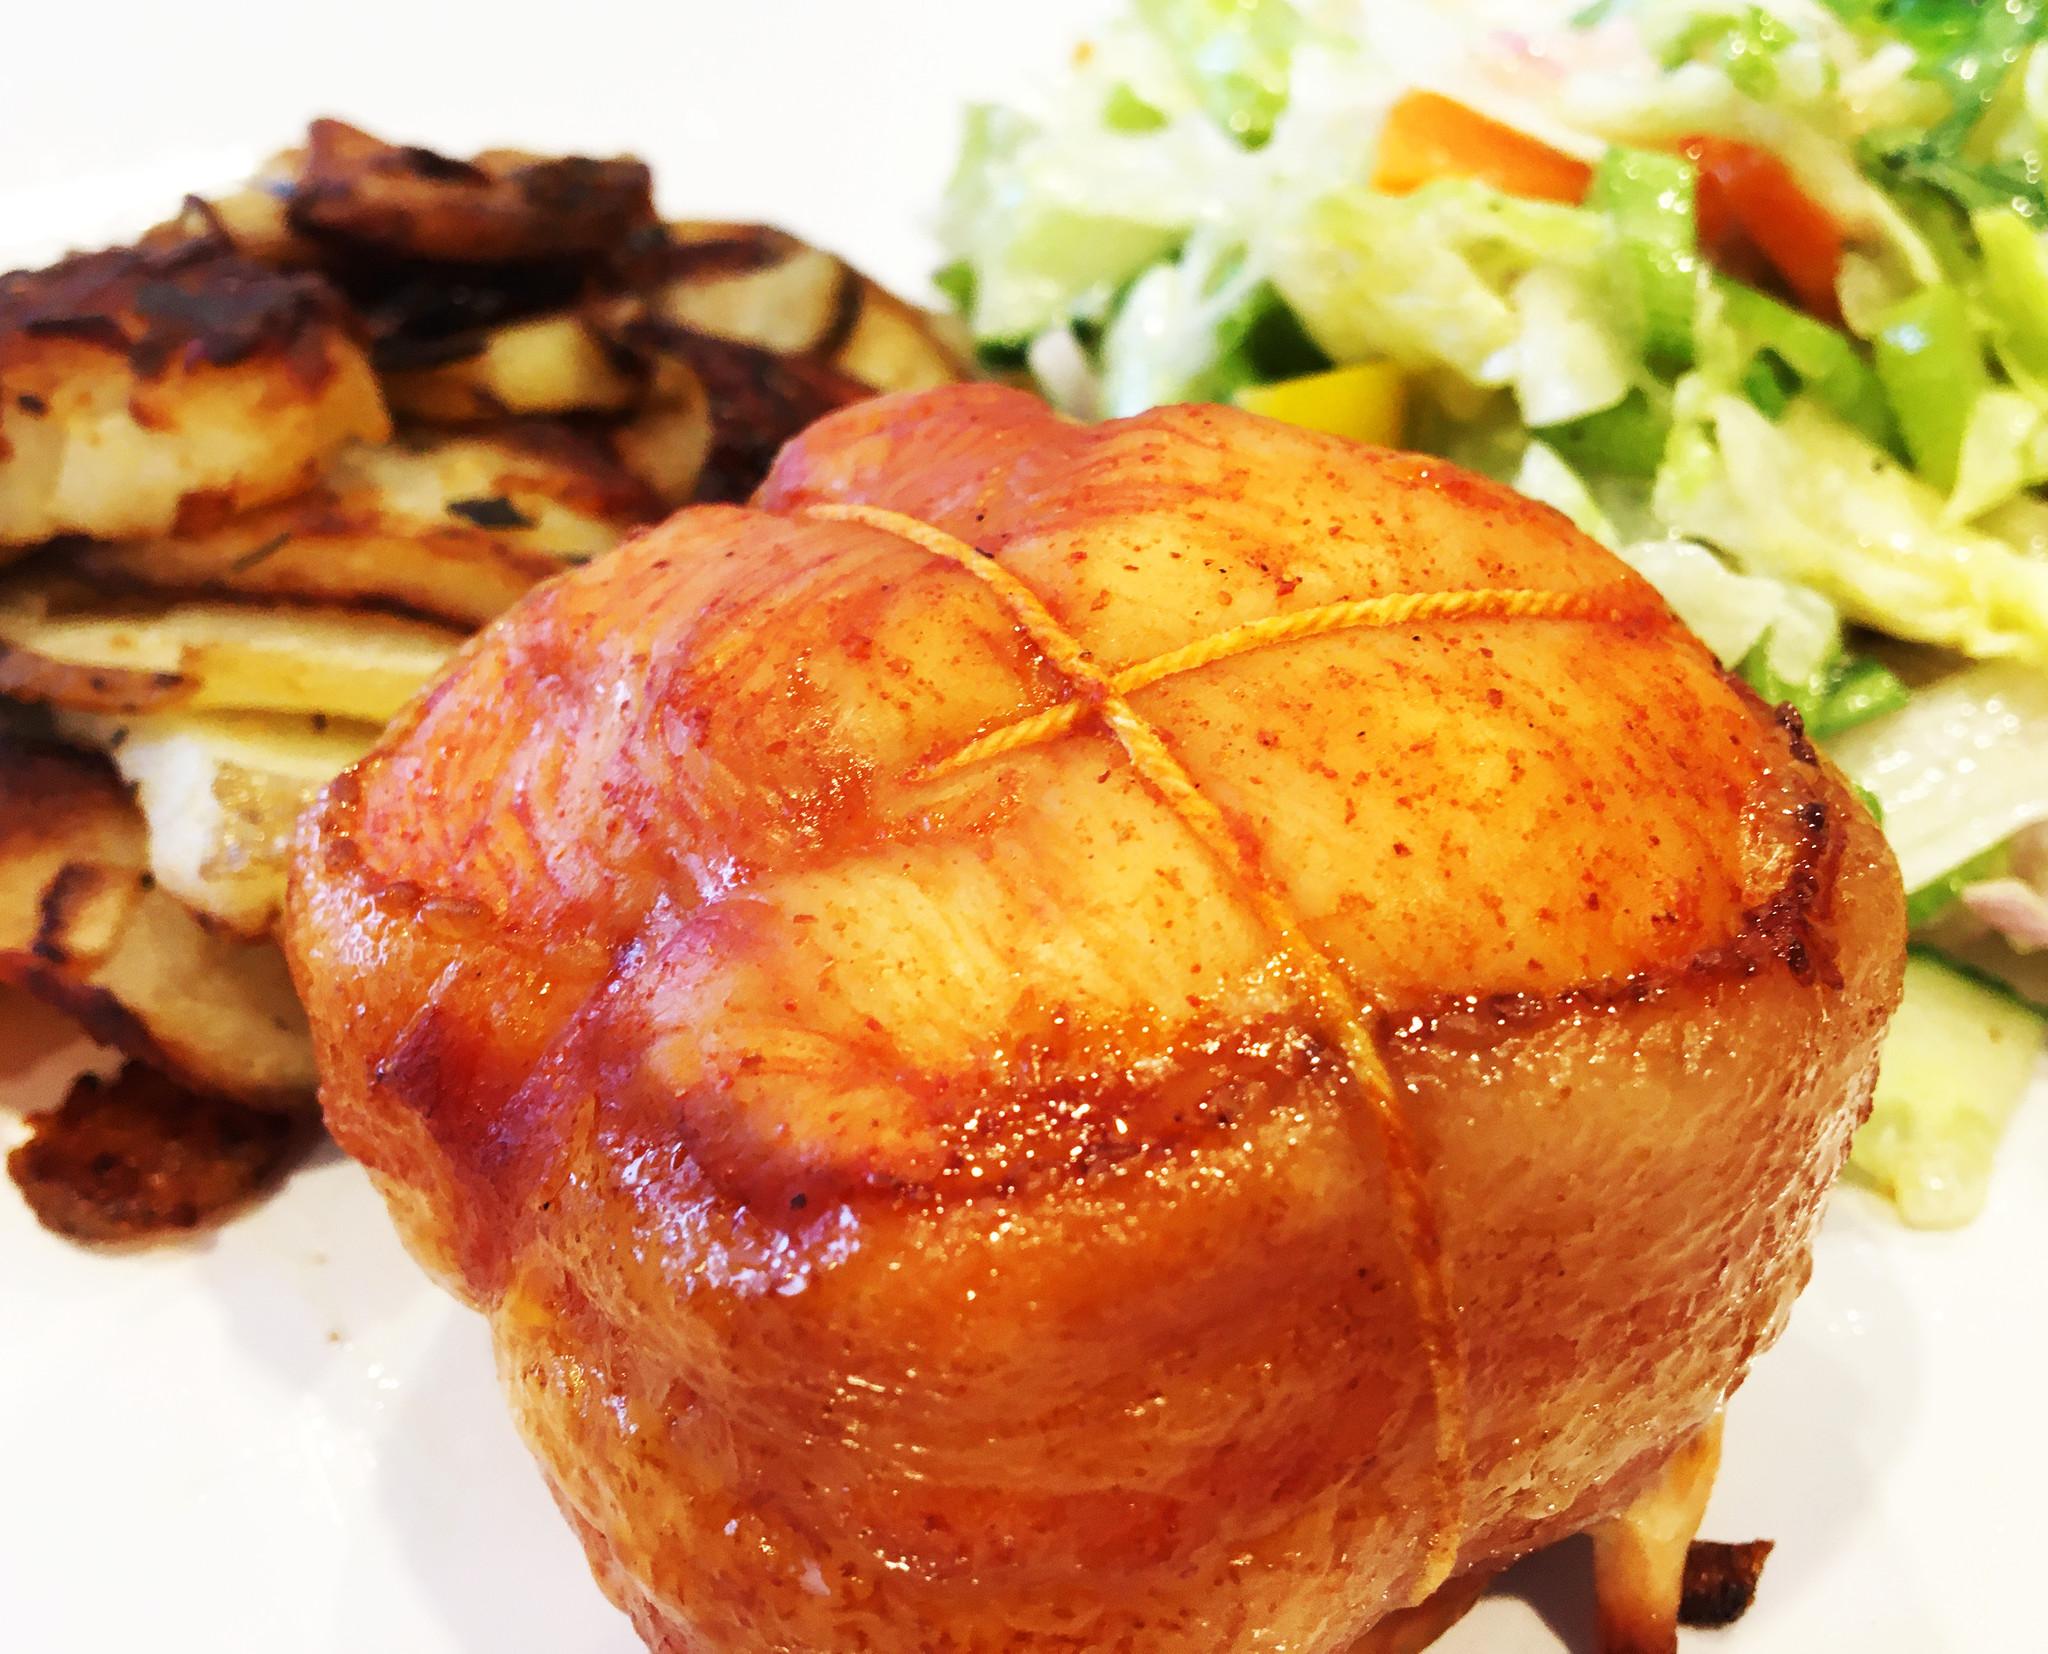 Chicken & bacon BBQ tournedos